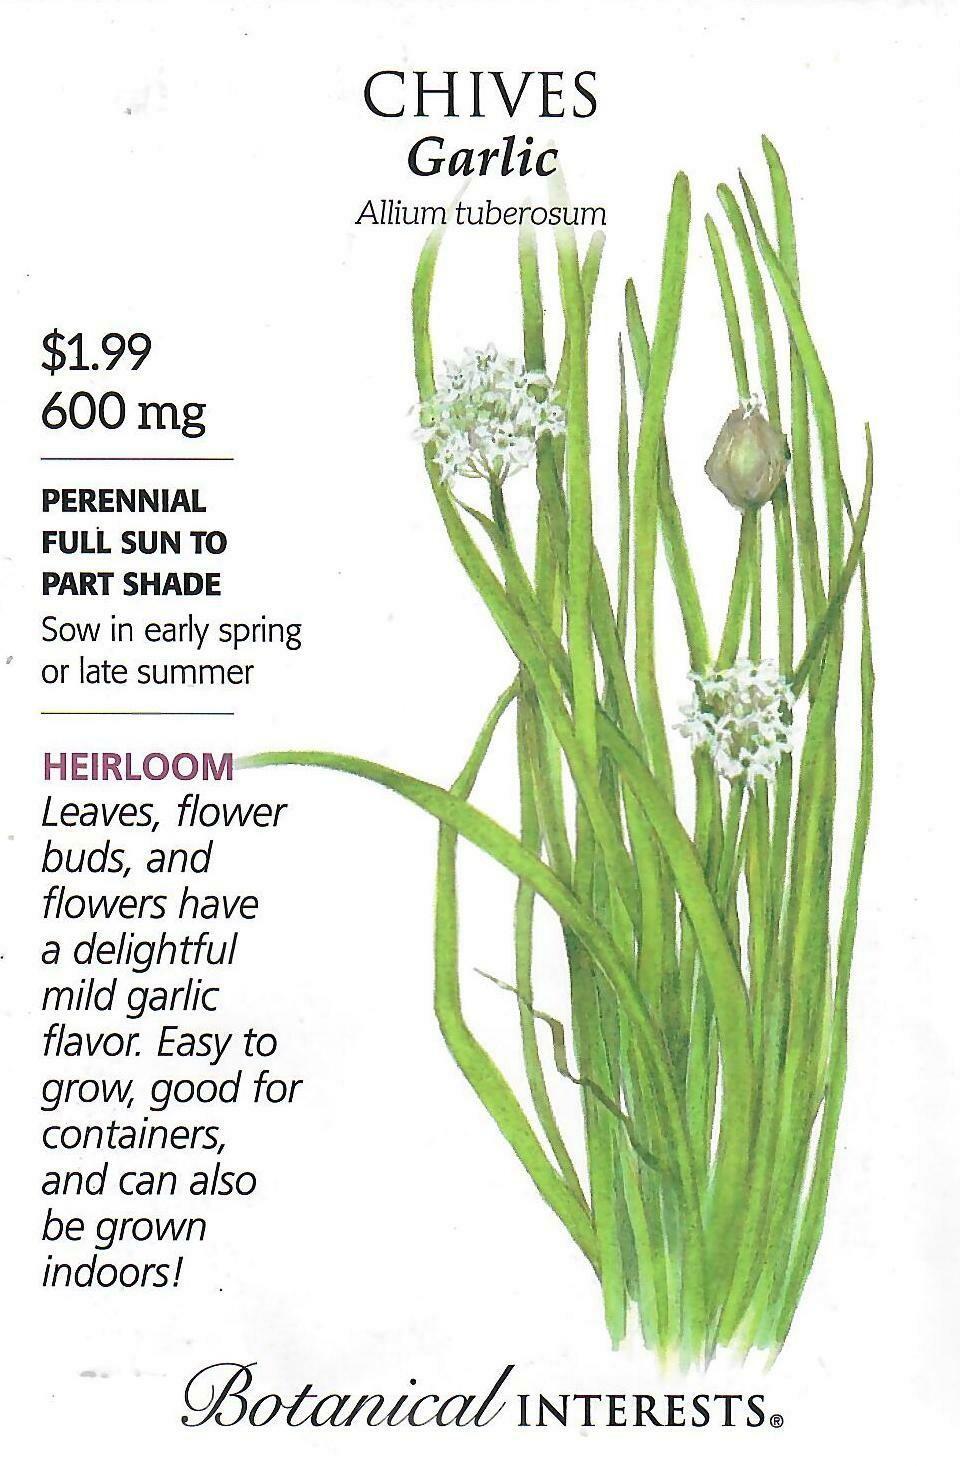 Chives Garlic Botanical Interests